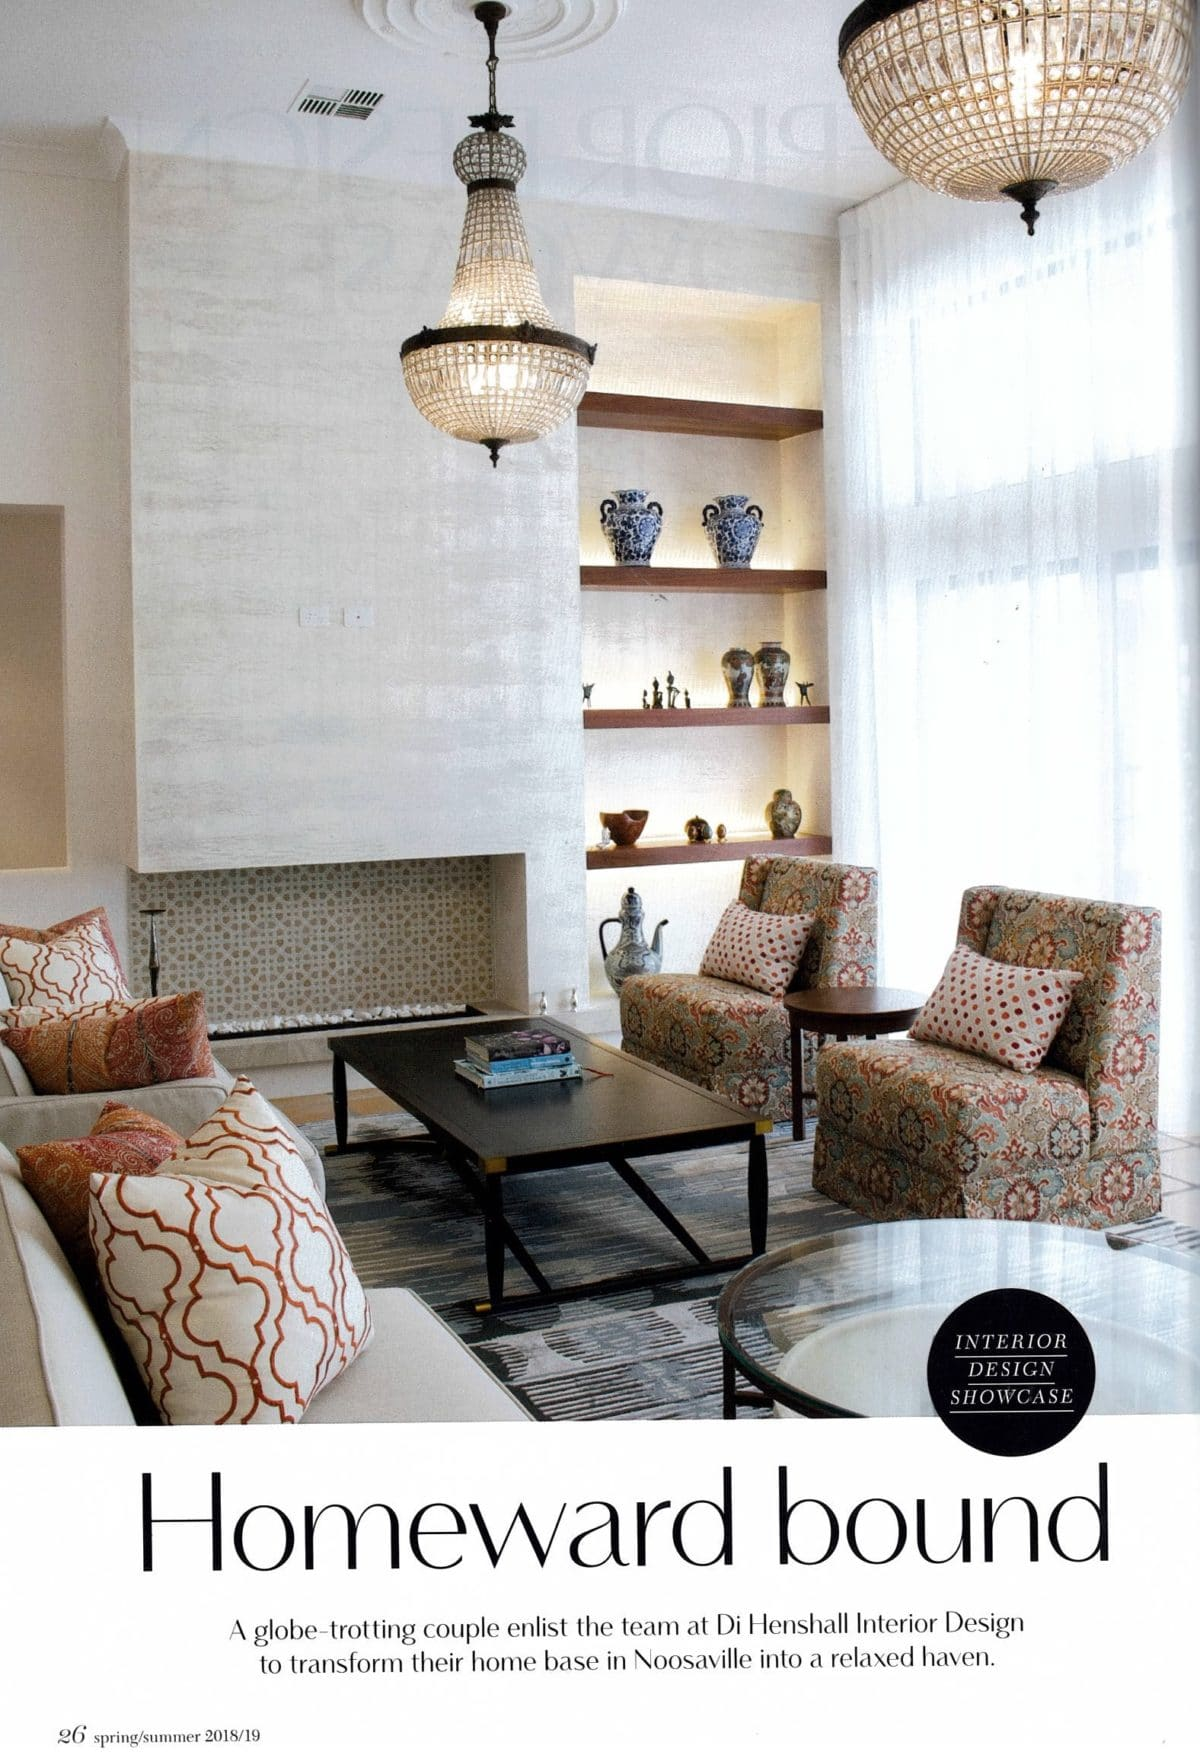 Homeward bound queensland homes spring summer 2018 for Siti di interior design